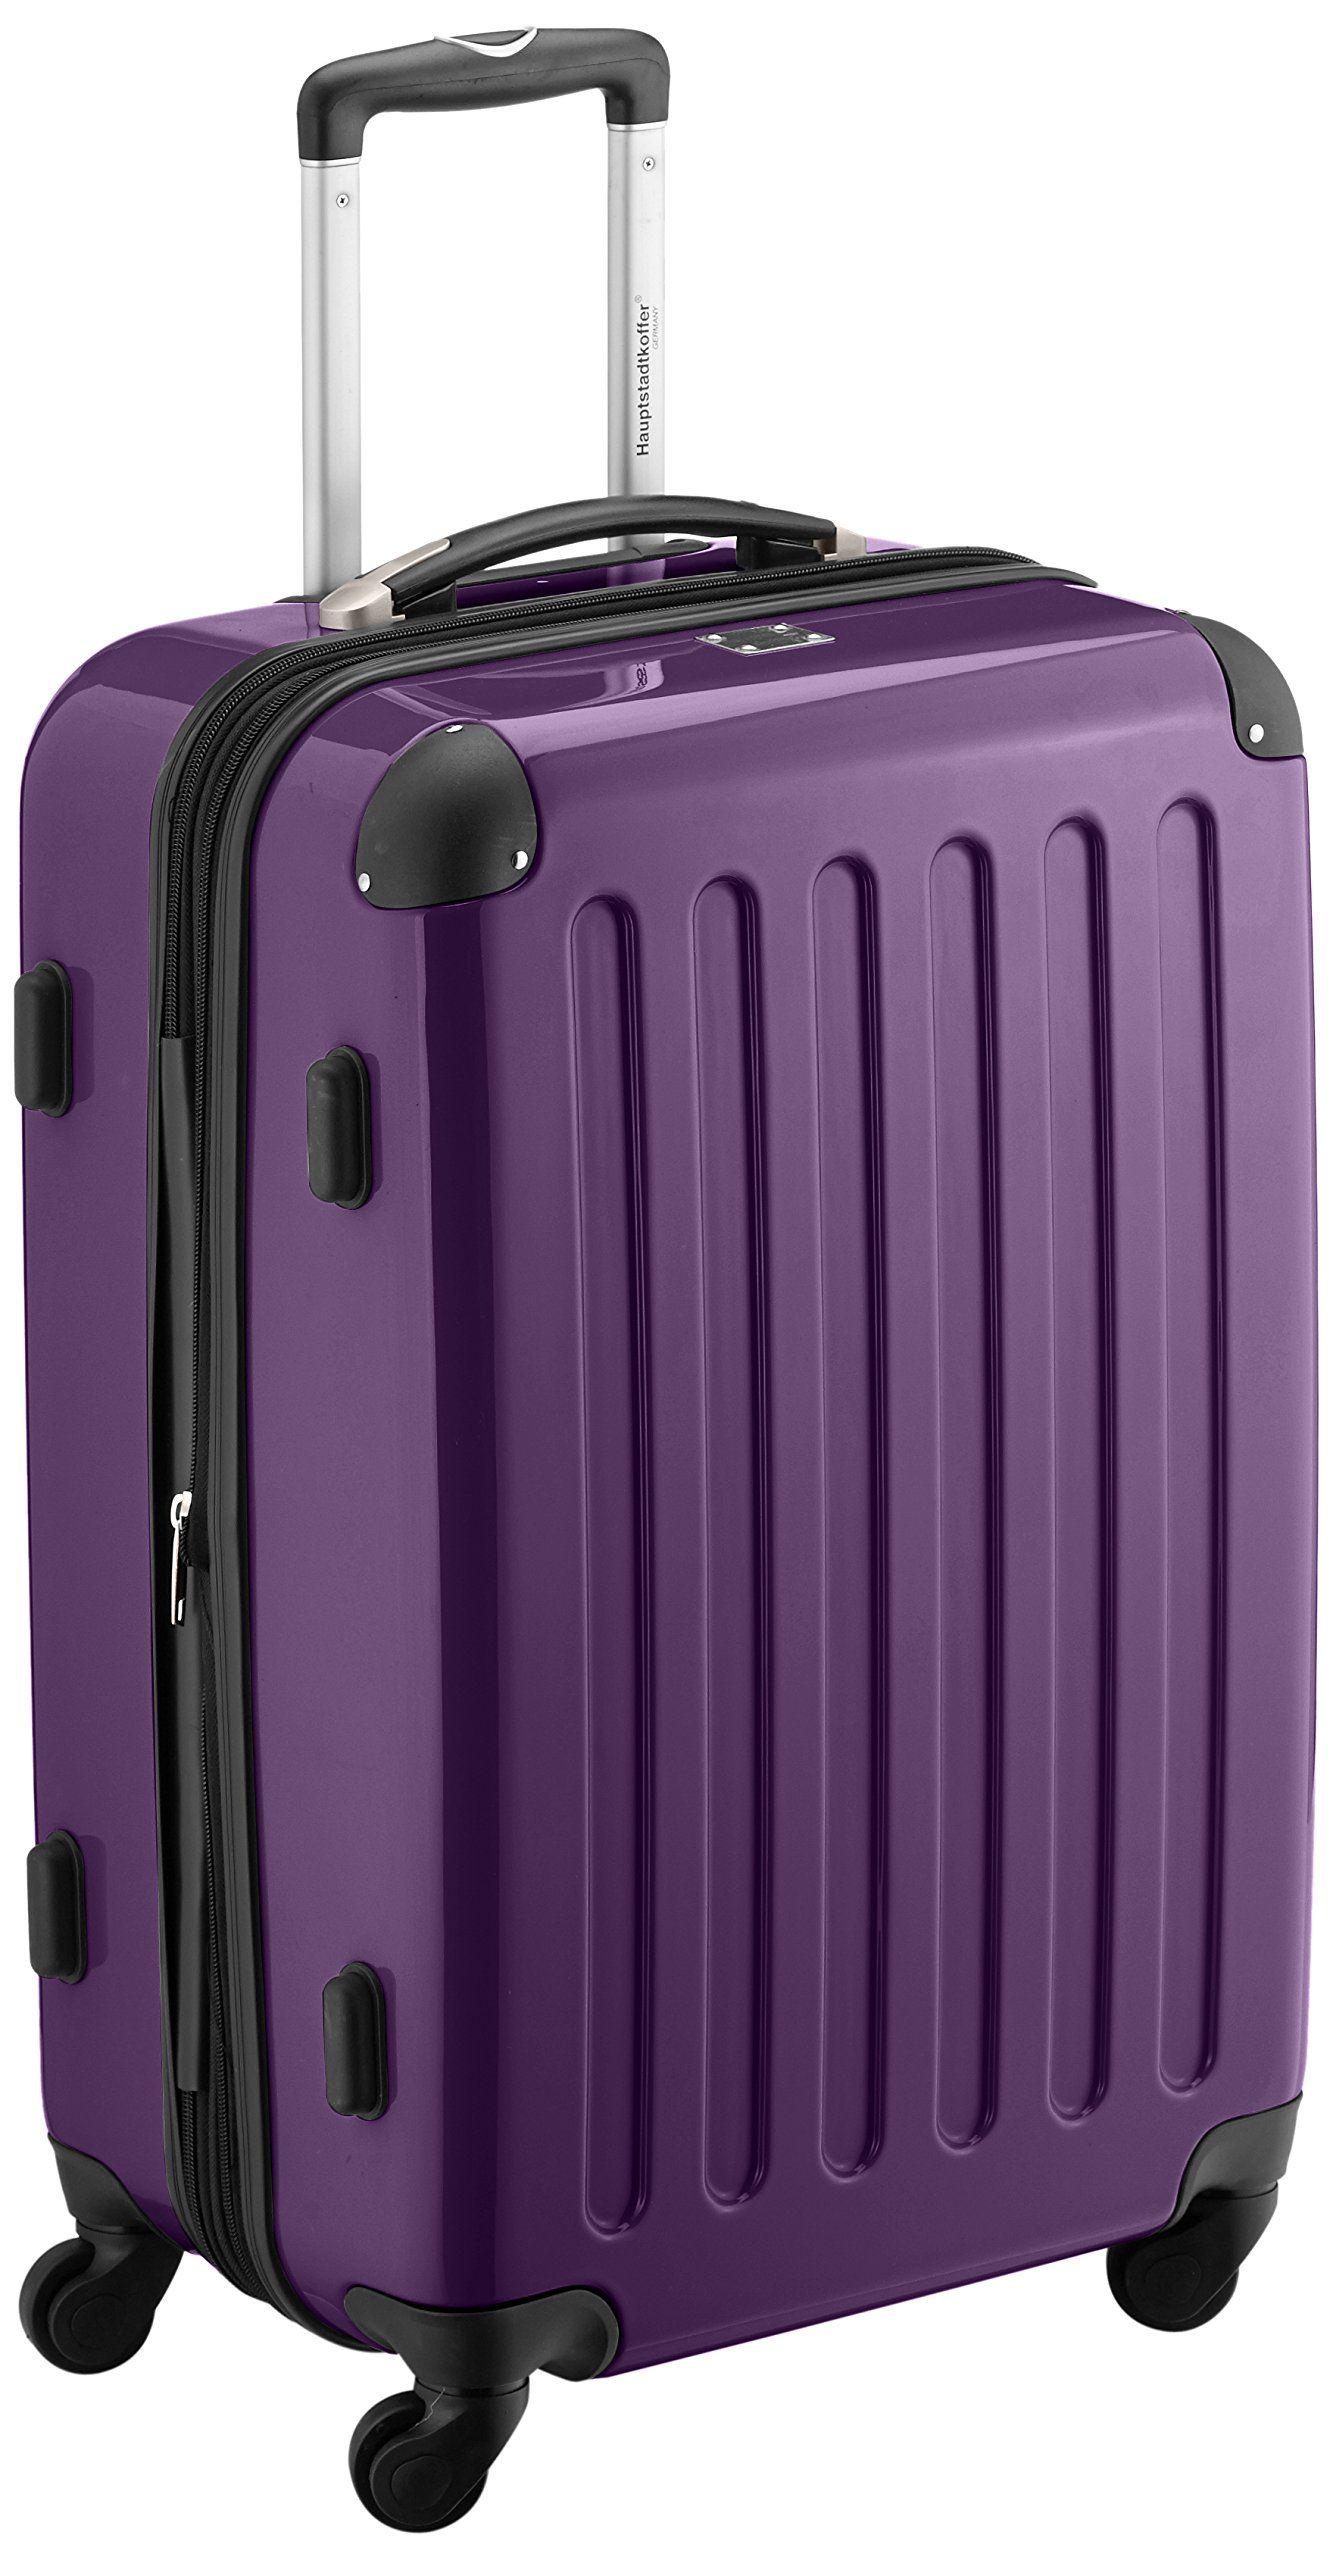 Alex Hauptstadtkoffer L Luggage Suitcase Hardside Spinner Trolley